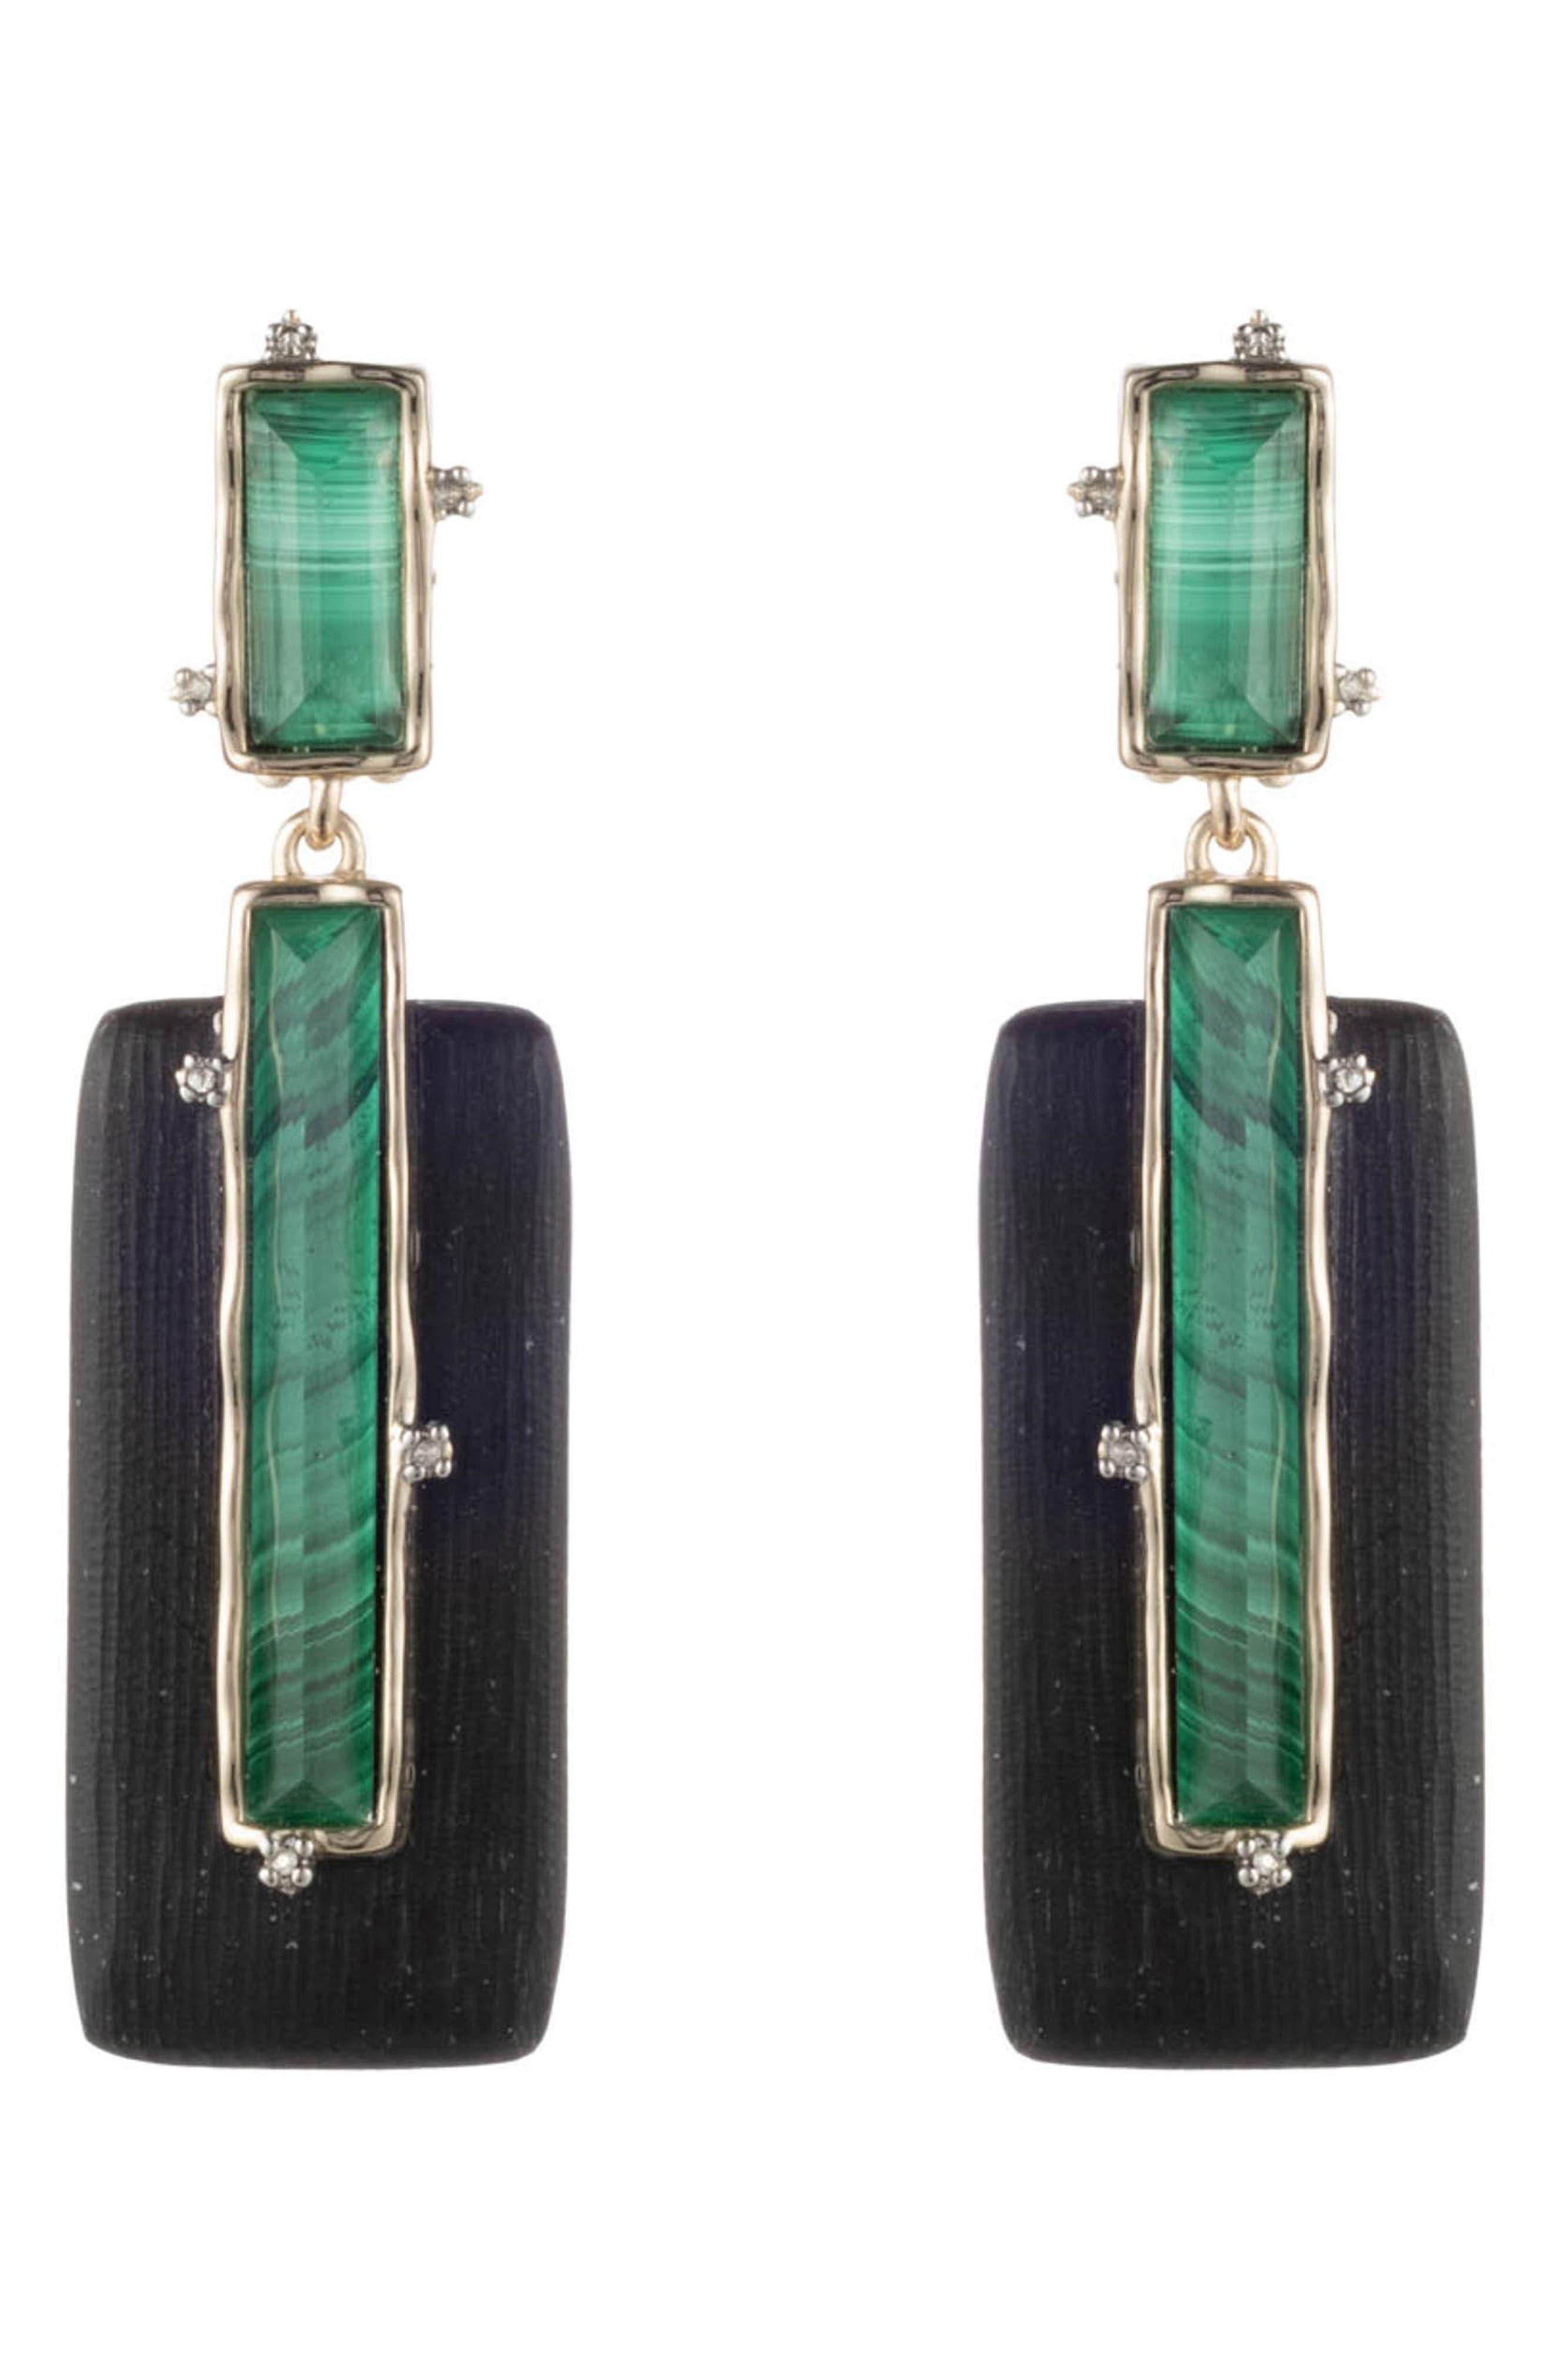 ALEXIS BITTAR Swarovski Crystal & Multi-Stone Studded Retro Clip Earrings in Black